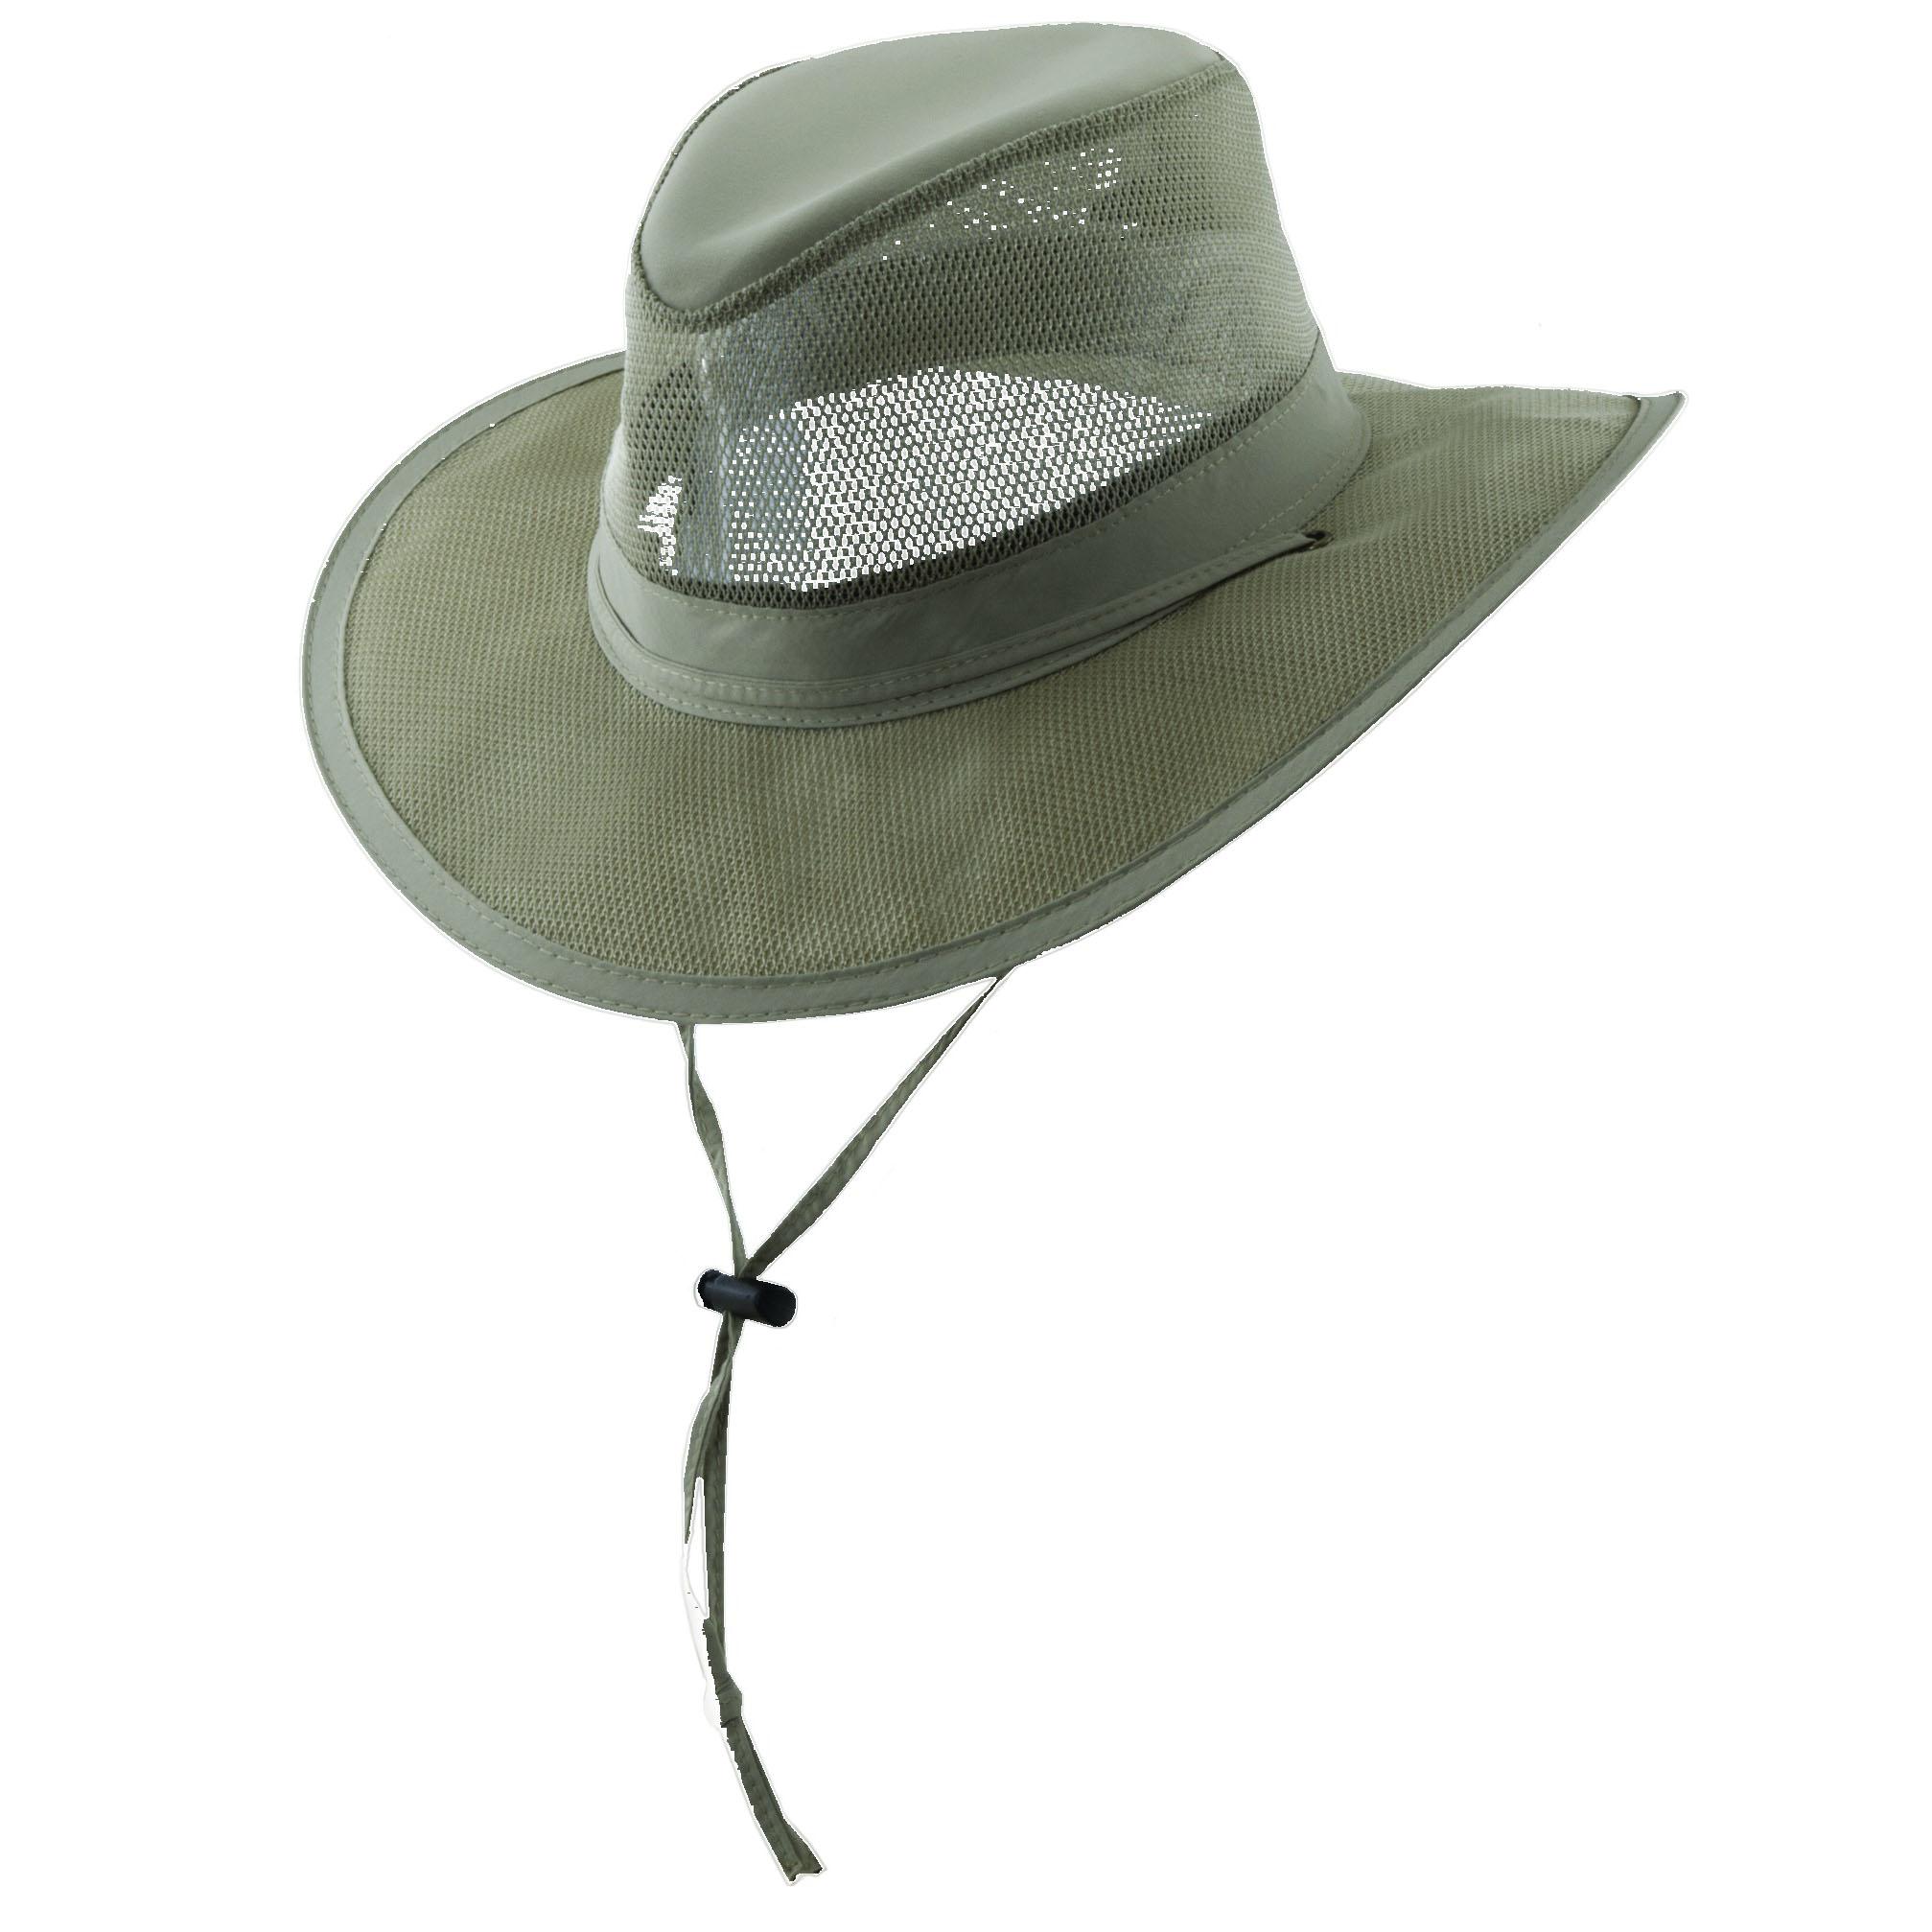 976a338a698 Supplex Nylon Safari Hat with Mesh Sidewall Khaki